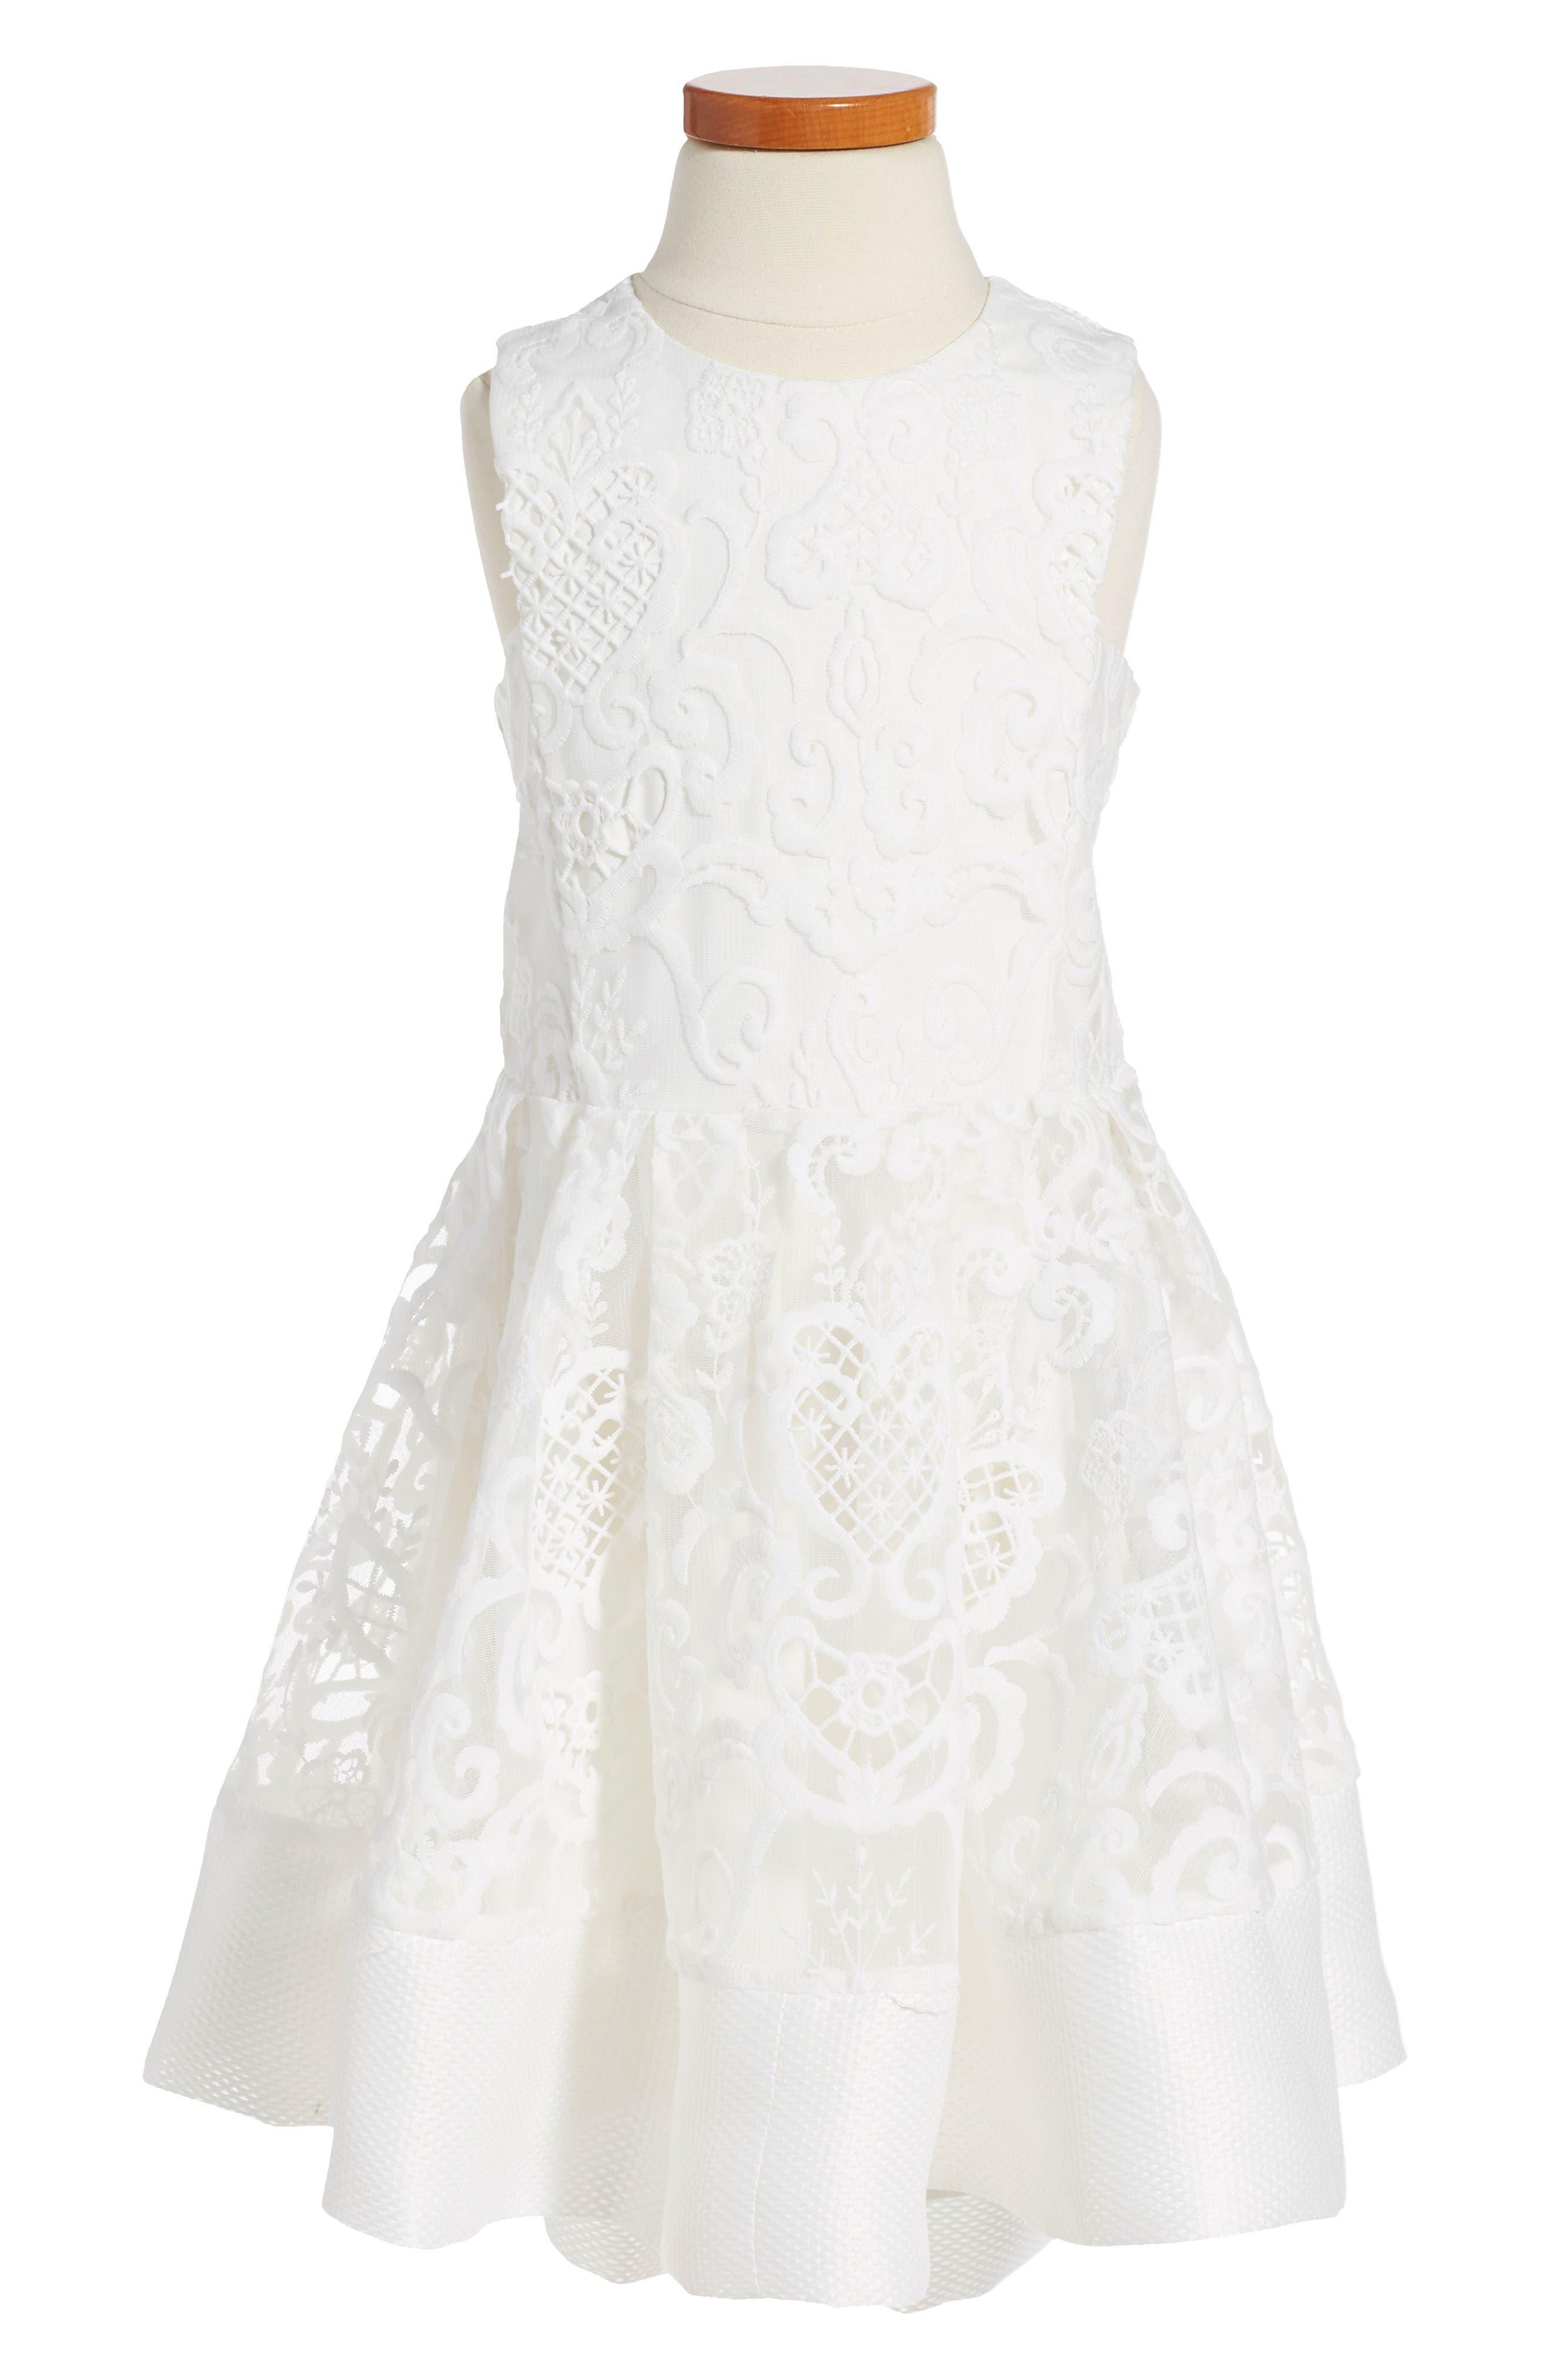 BARDOT JUNIOR Debut Embroidered Fit & Flare Dress